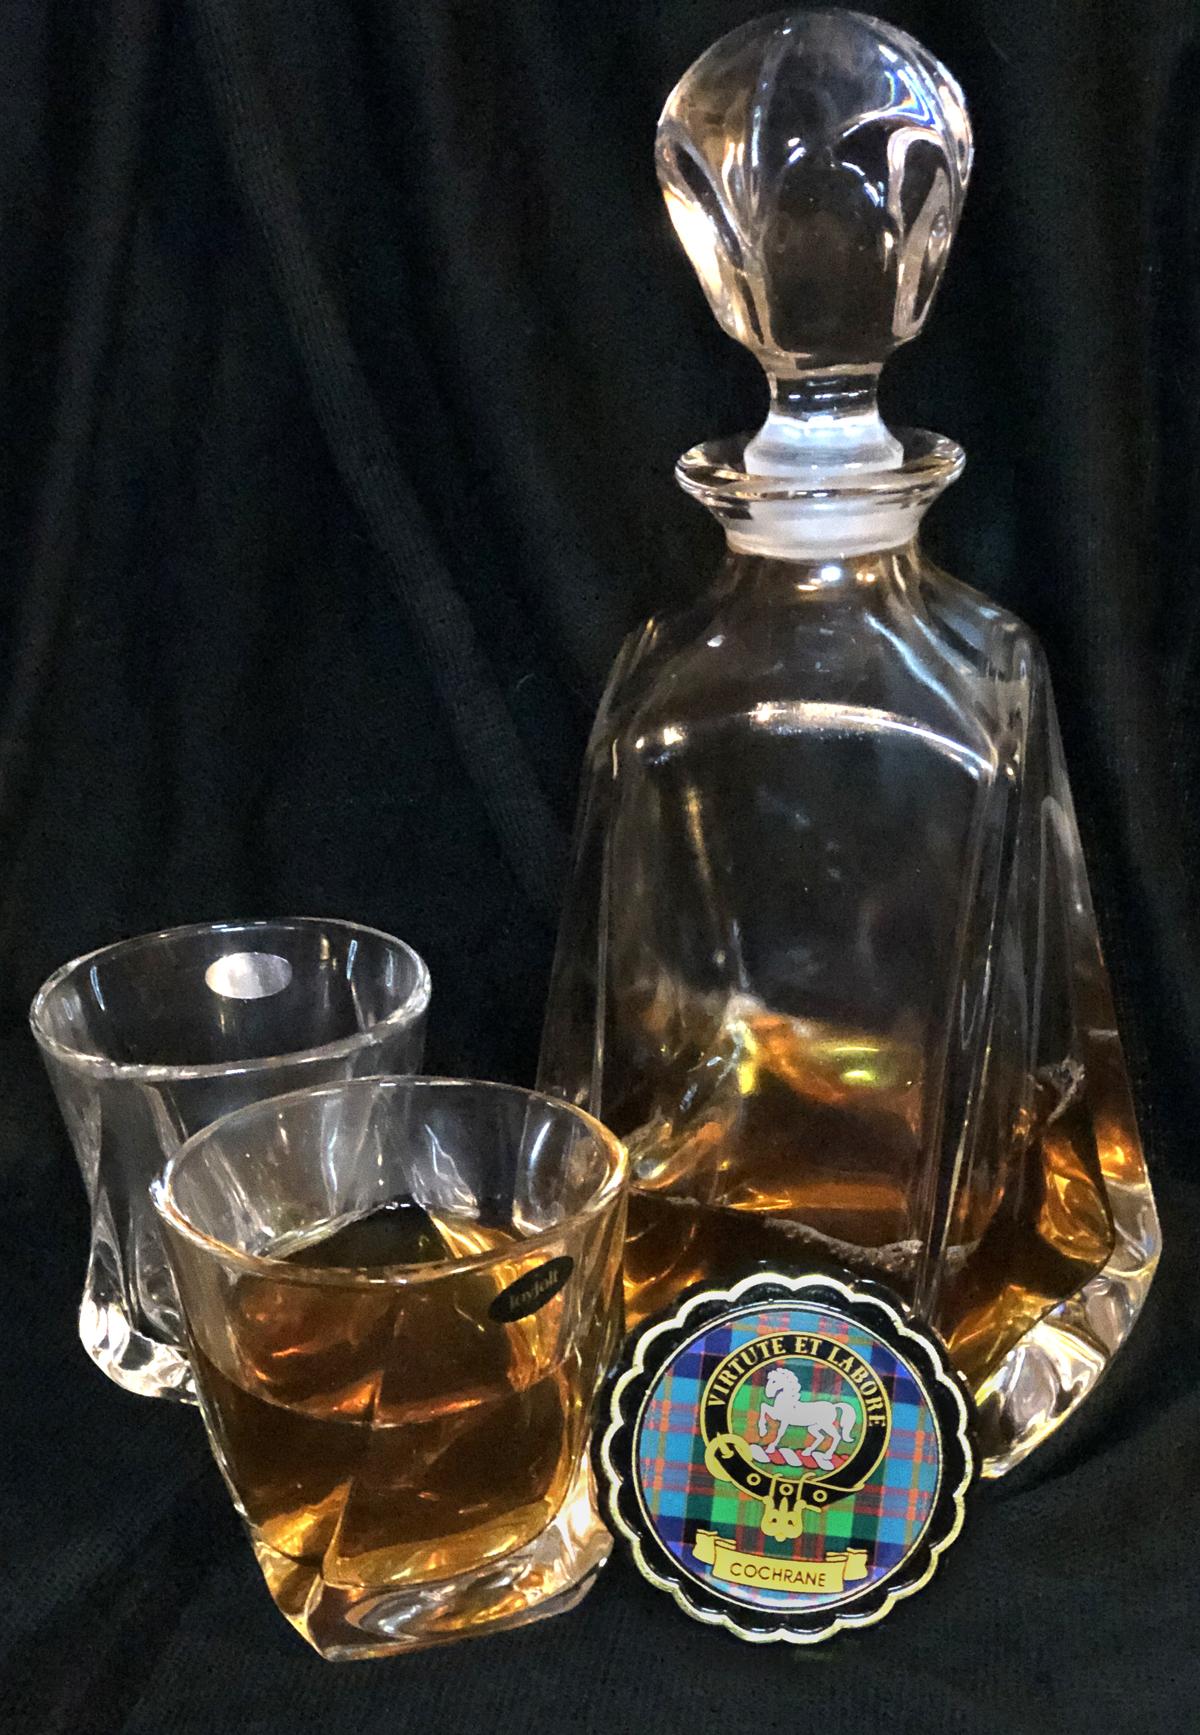 quality glassware